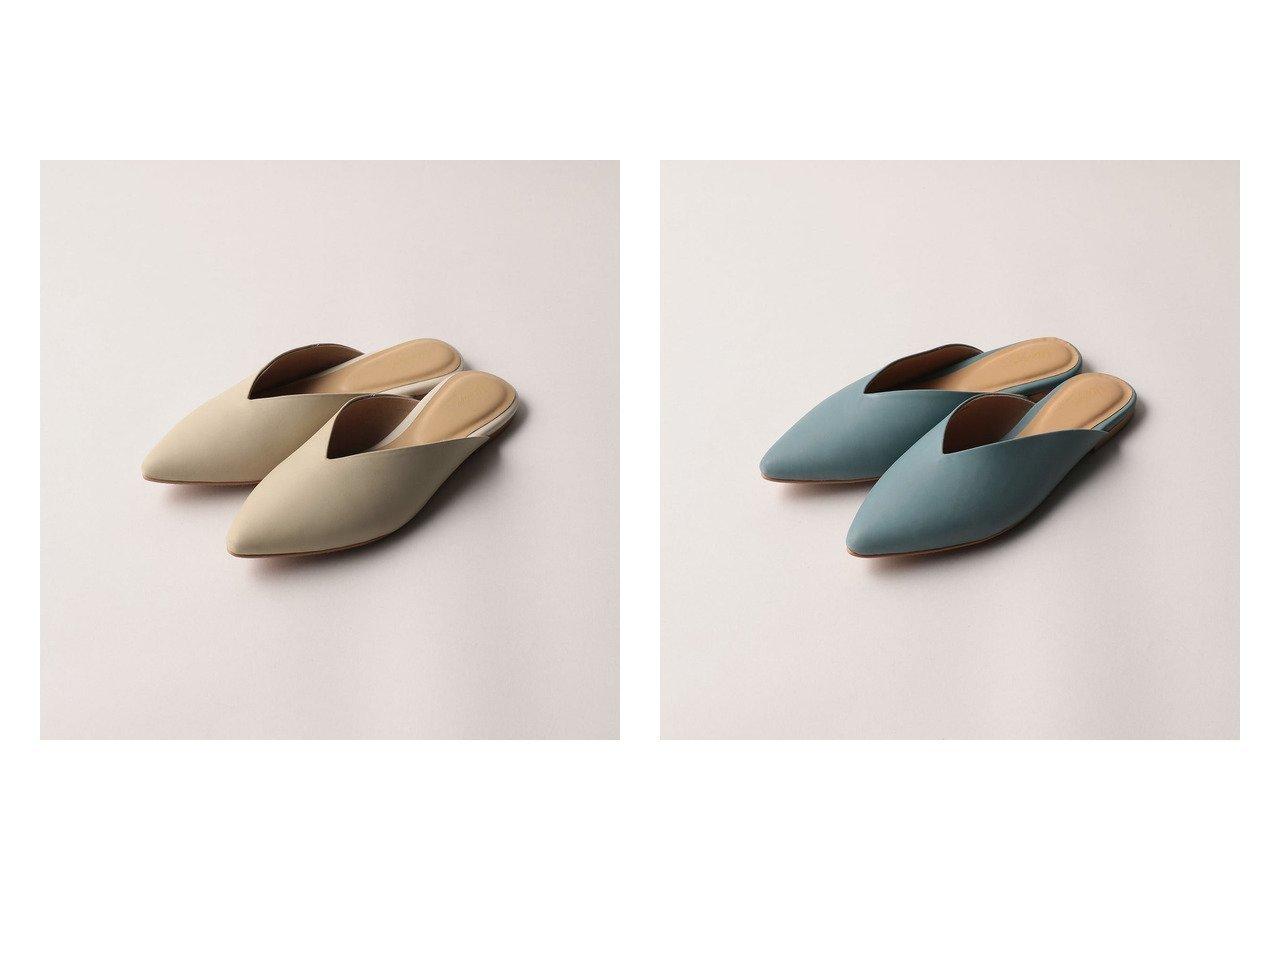 【Odette e Odile/オデット エ オディール】のオデット エ オディール ODETTE E ODILE UTALIYA V-Cut SLP 【シューズ・靴】おすすめ!人気、トレンド・レディースファッションの通販 おすすめで人気の流行・トレンド、ファッションの通販商品 インテリア・家具・メンズファッション・キッズファッション・レディースファッション・服の通販 founy(ファニー) https://founy.com/ ファッション Fashion レディースファッション WOMEN 2021年 2021 2021春夏・S/S SS/Spring/Summer/2021 S/S・春夏 SS・Spring/Summer シューズ スリッパ フラット ポインテッド ロング 夏 Summer 春 Spring  ID:crp329100000052548